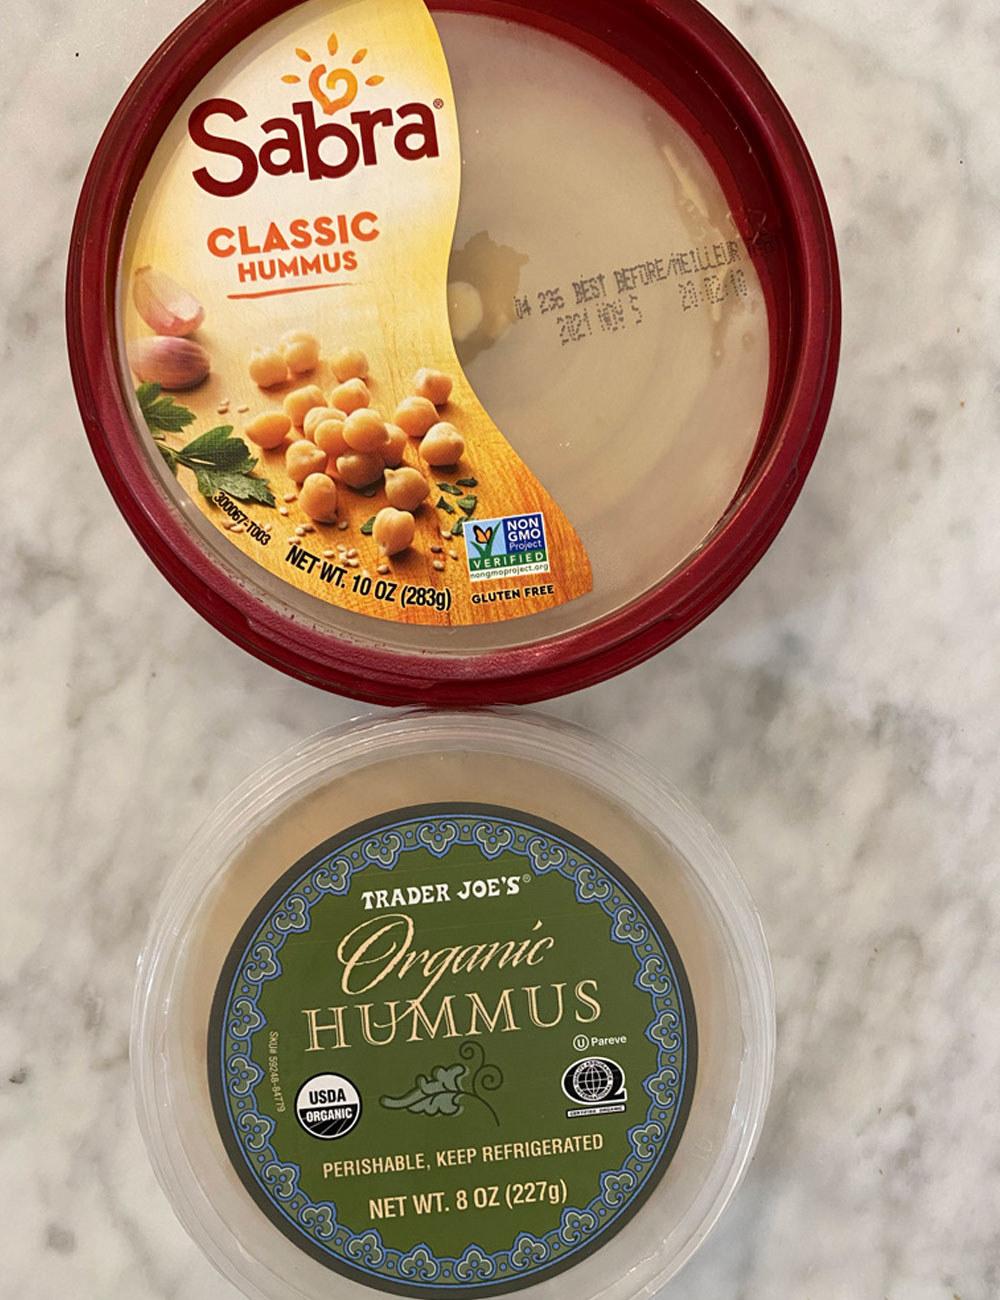 Sabra hummus and Trader Joe's hummus in the packaging